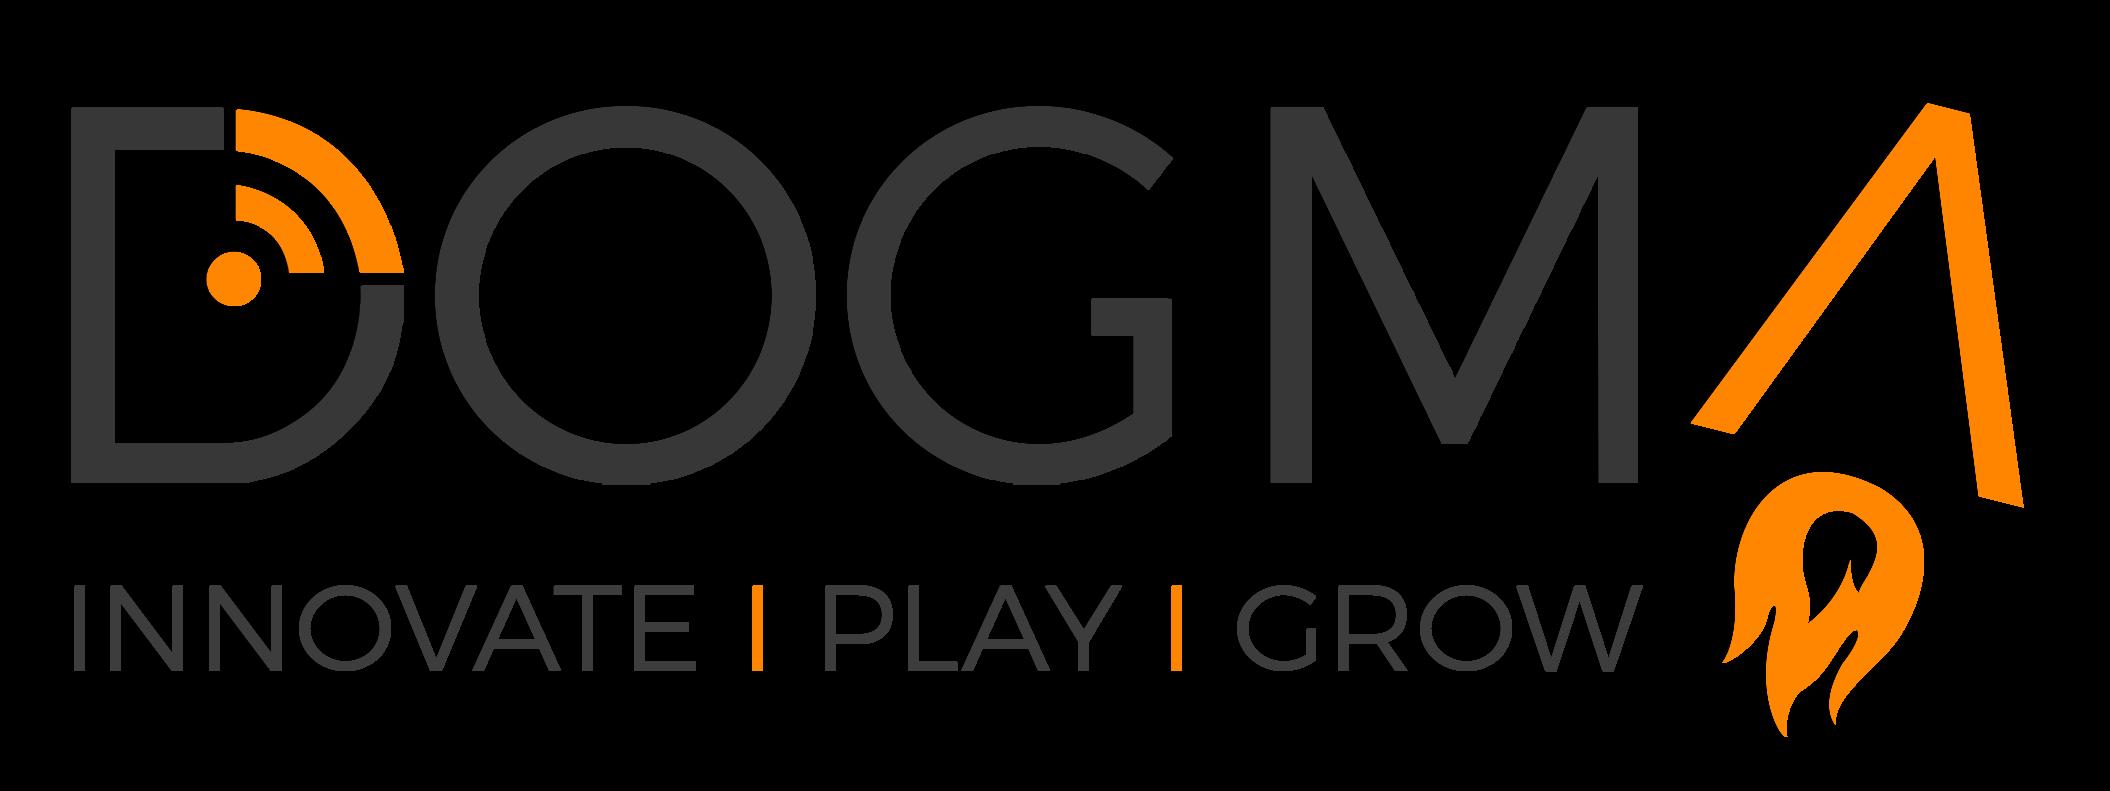 Dogma Marketing International – Blog